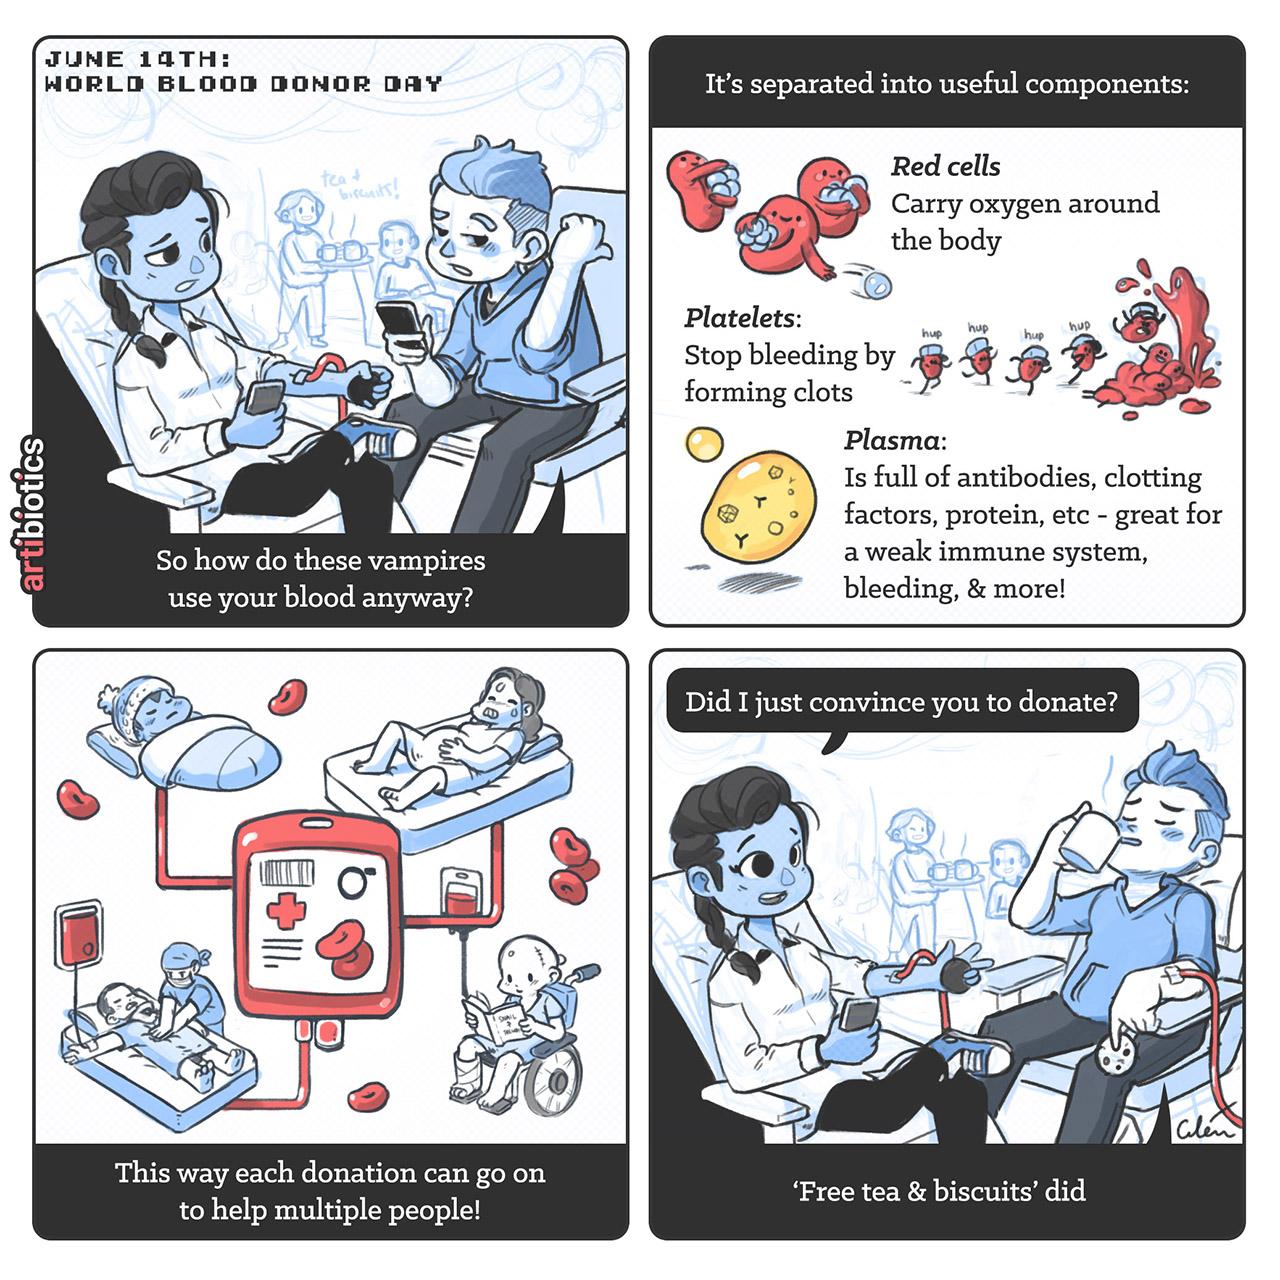 World Blood Donor Day. Cartoon by Dr Ciléin Kearns (Artibiotics)